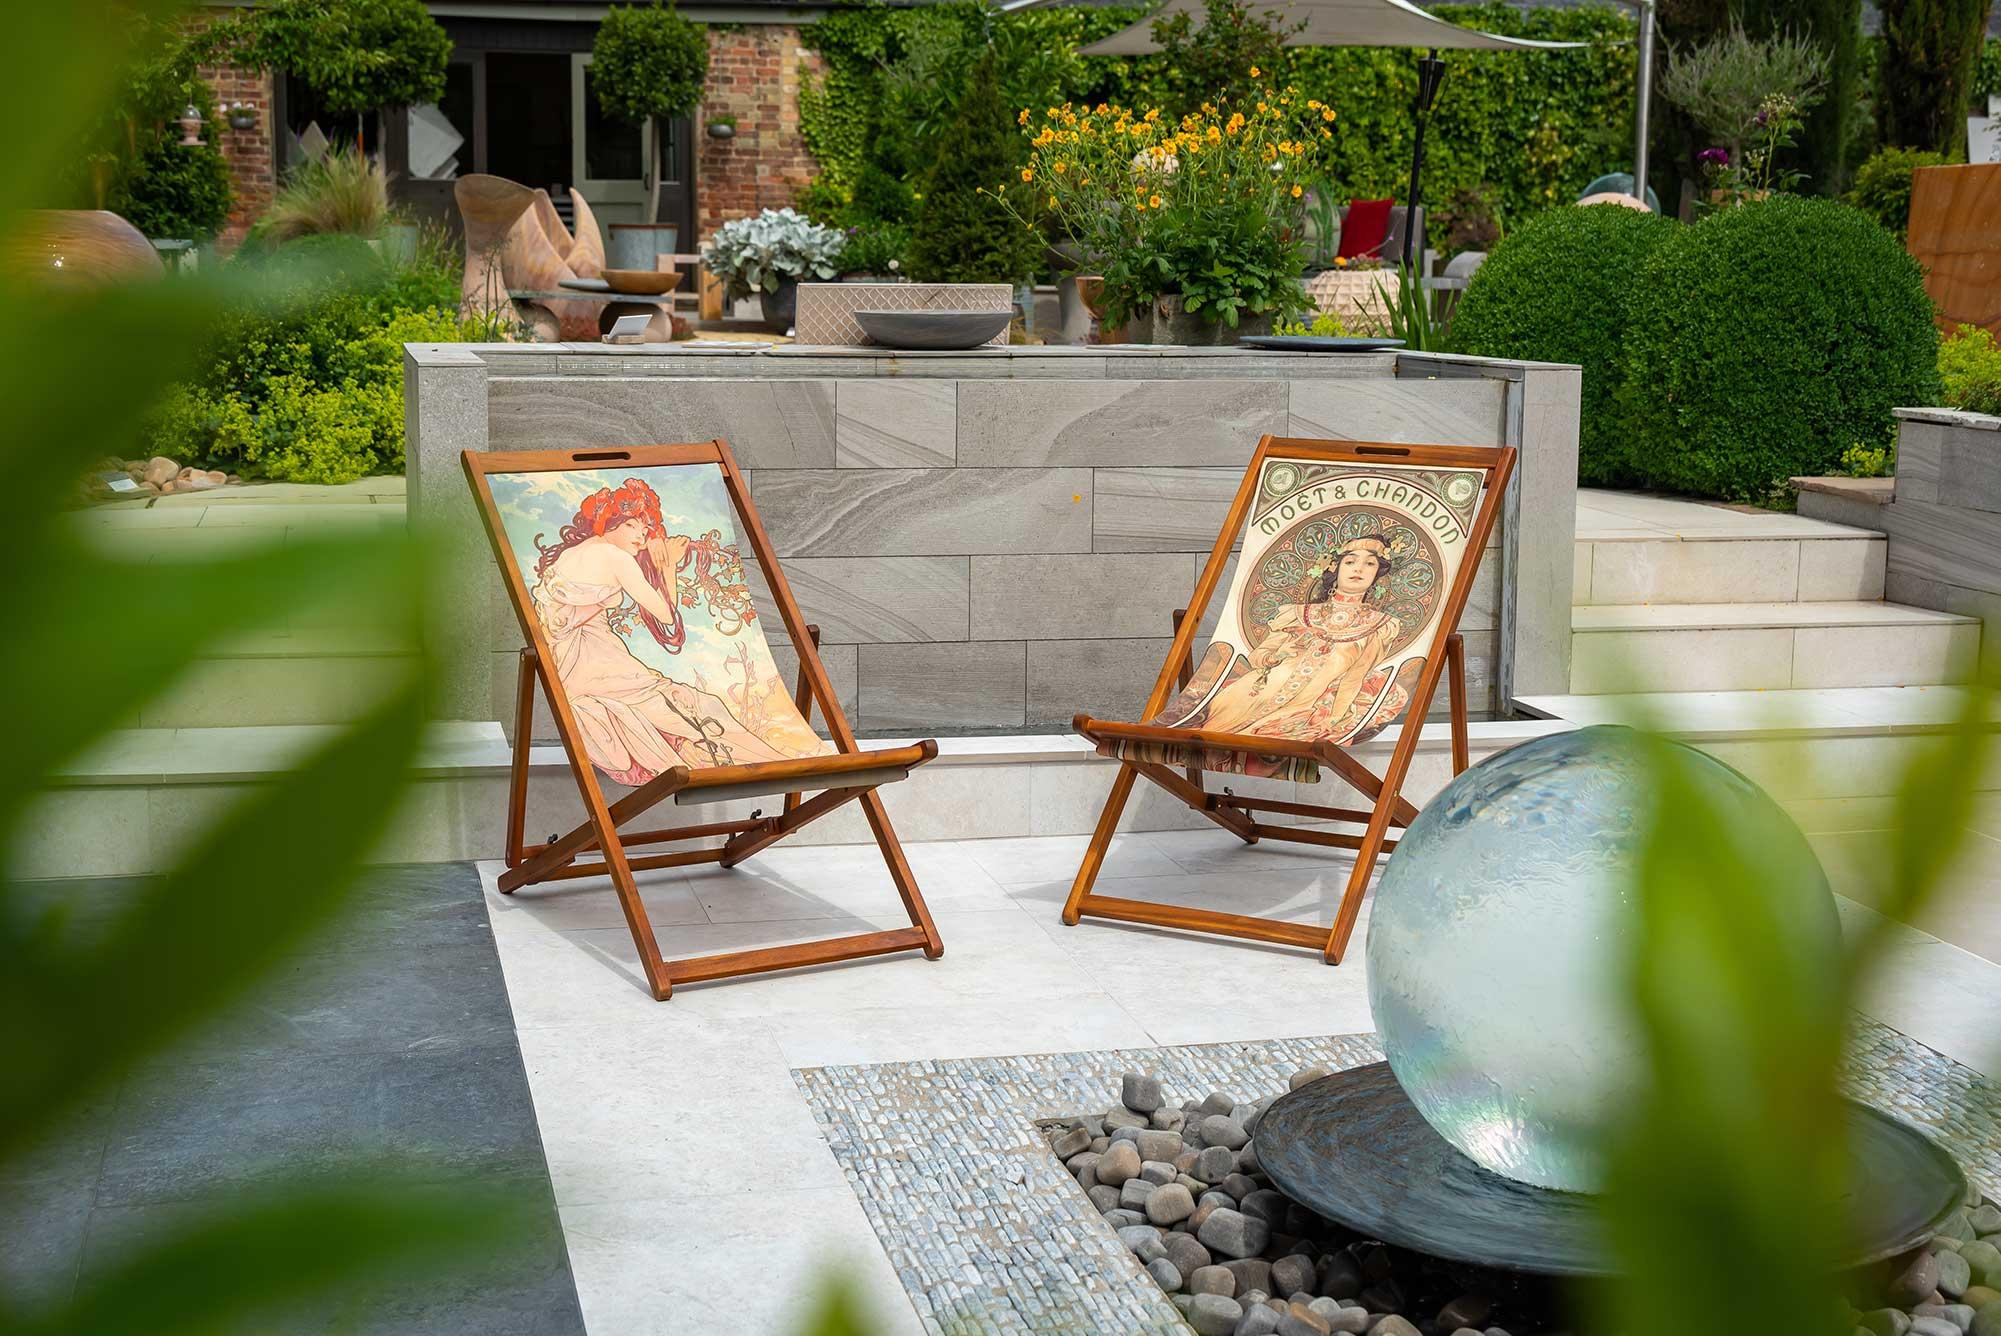 pair of deckchairs